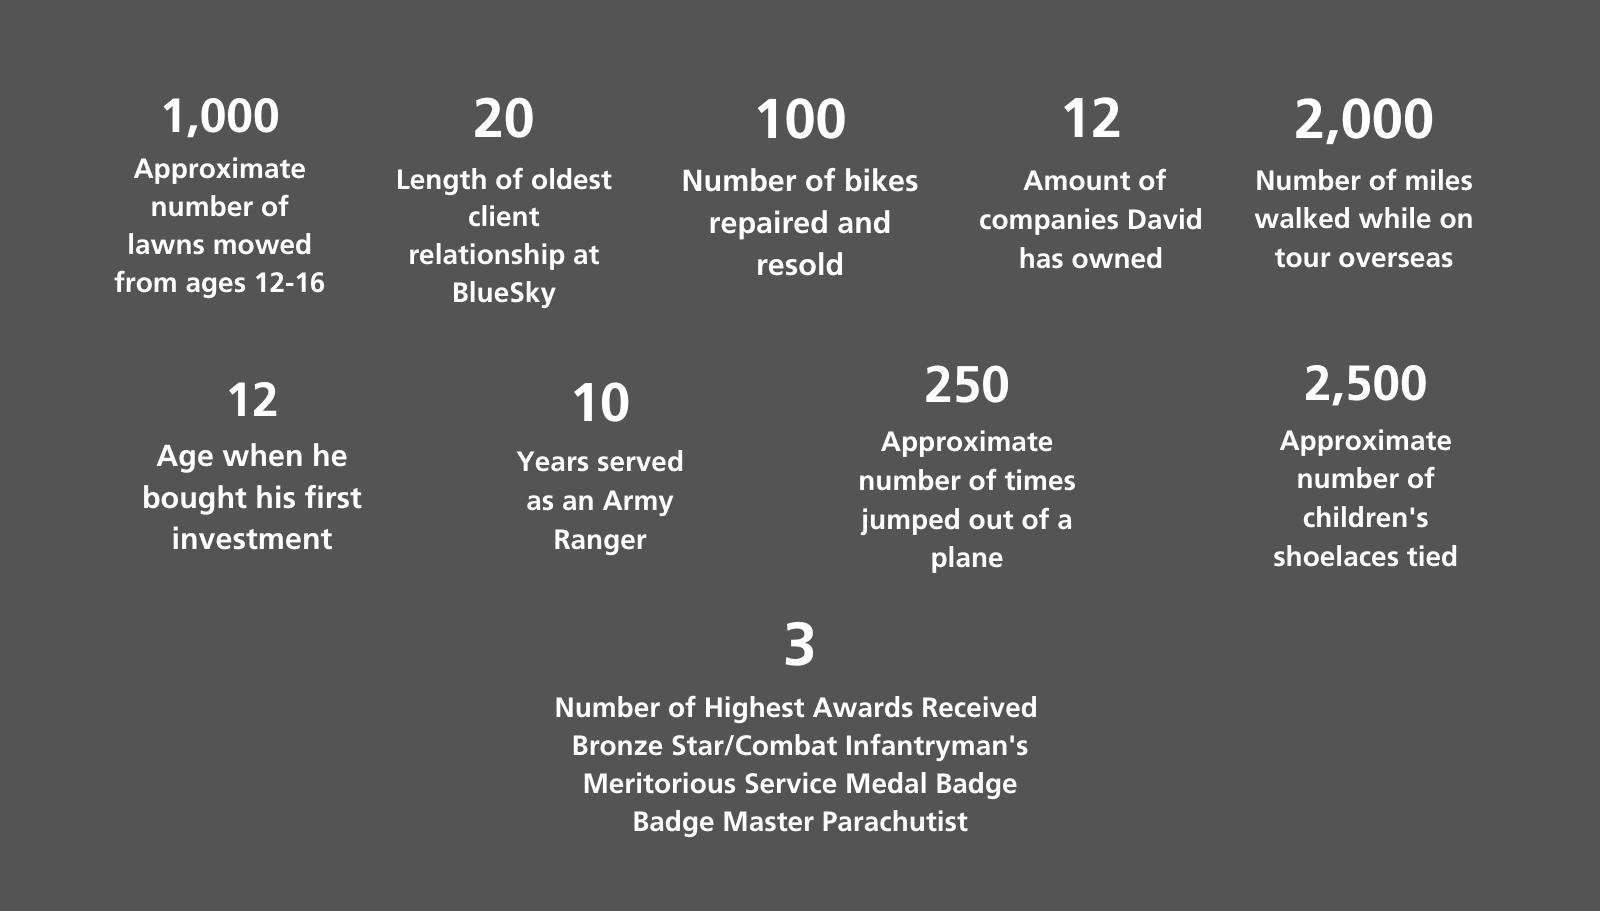 David Infographic